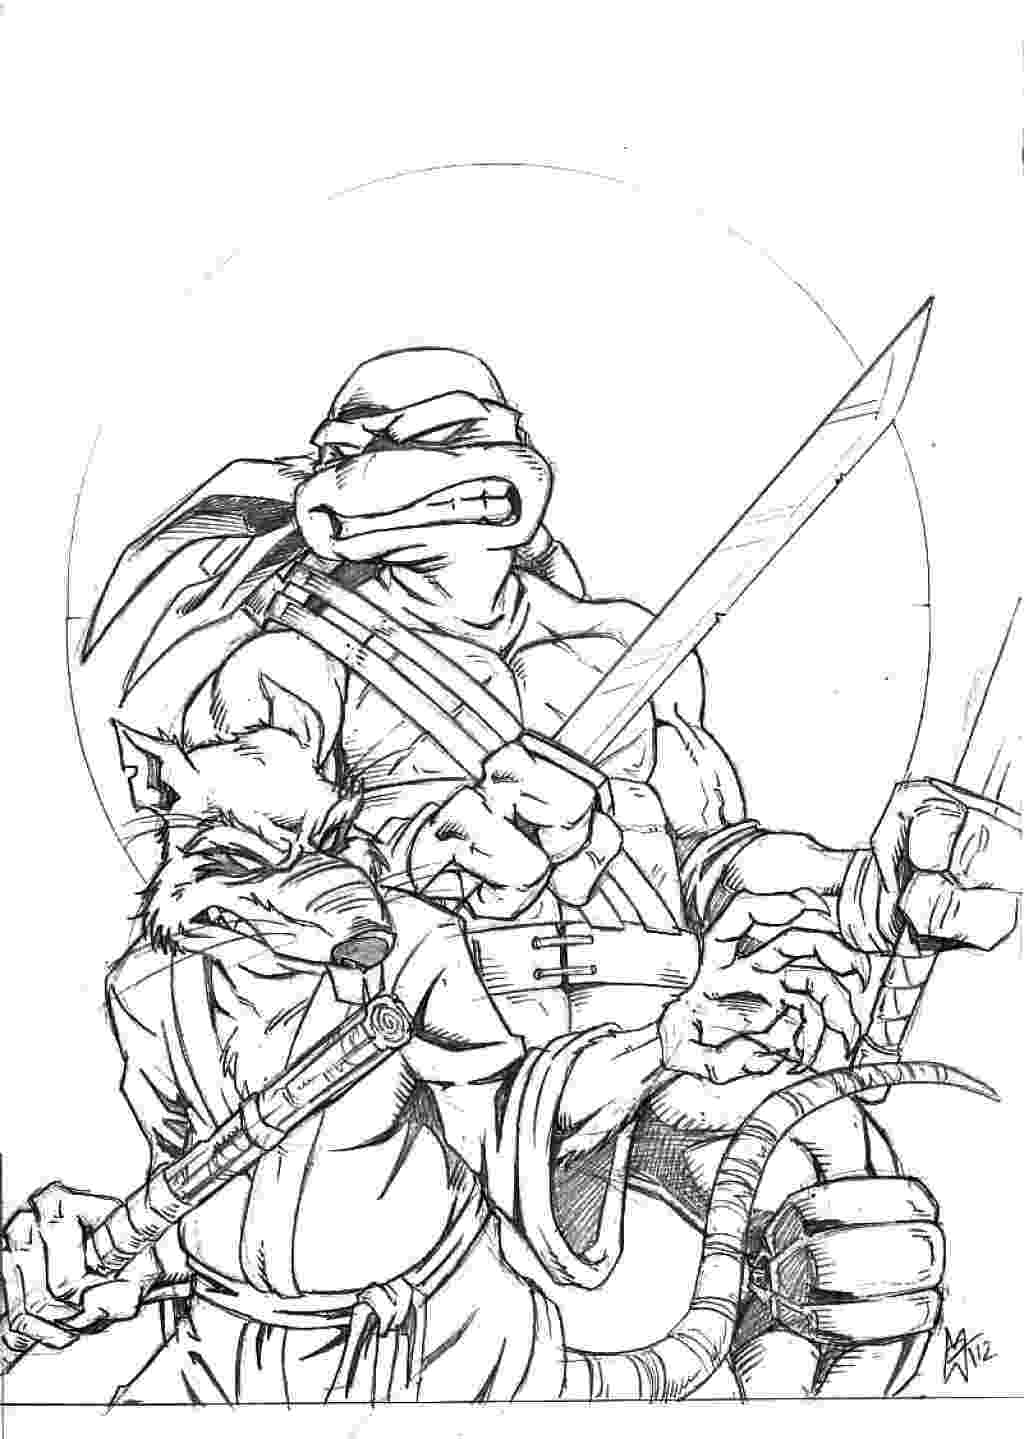 ninja turtles colouring pages print download the attractive ninja coloring pages for colouring turtles ninja pages